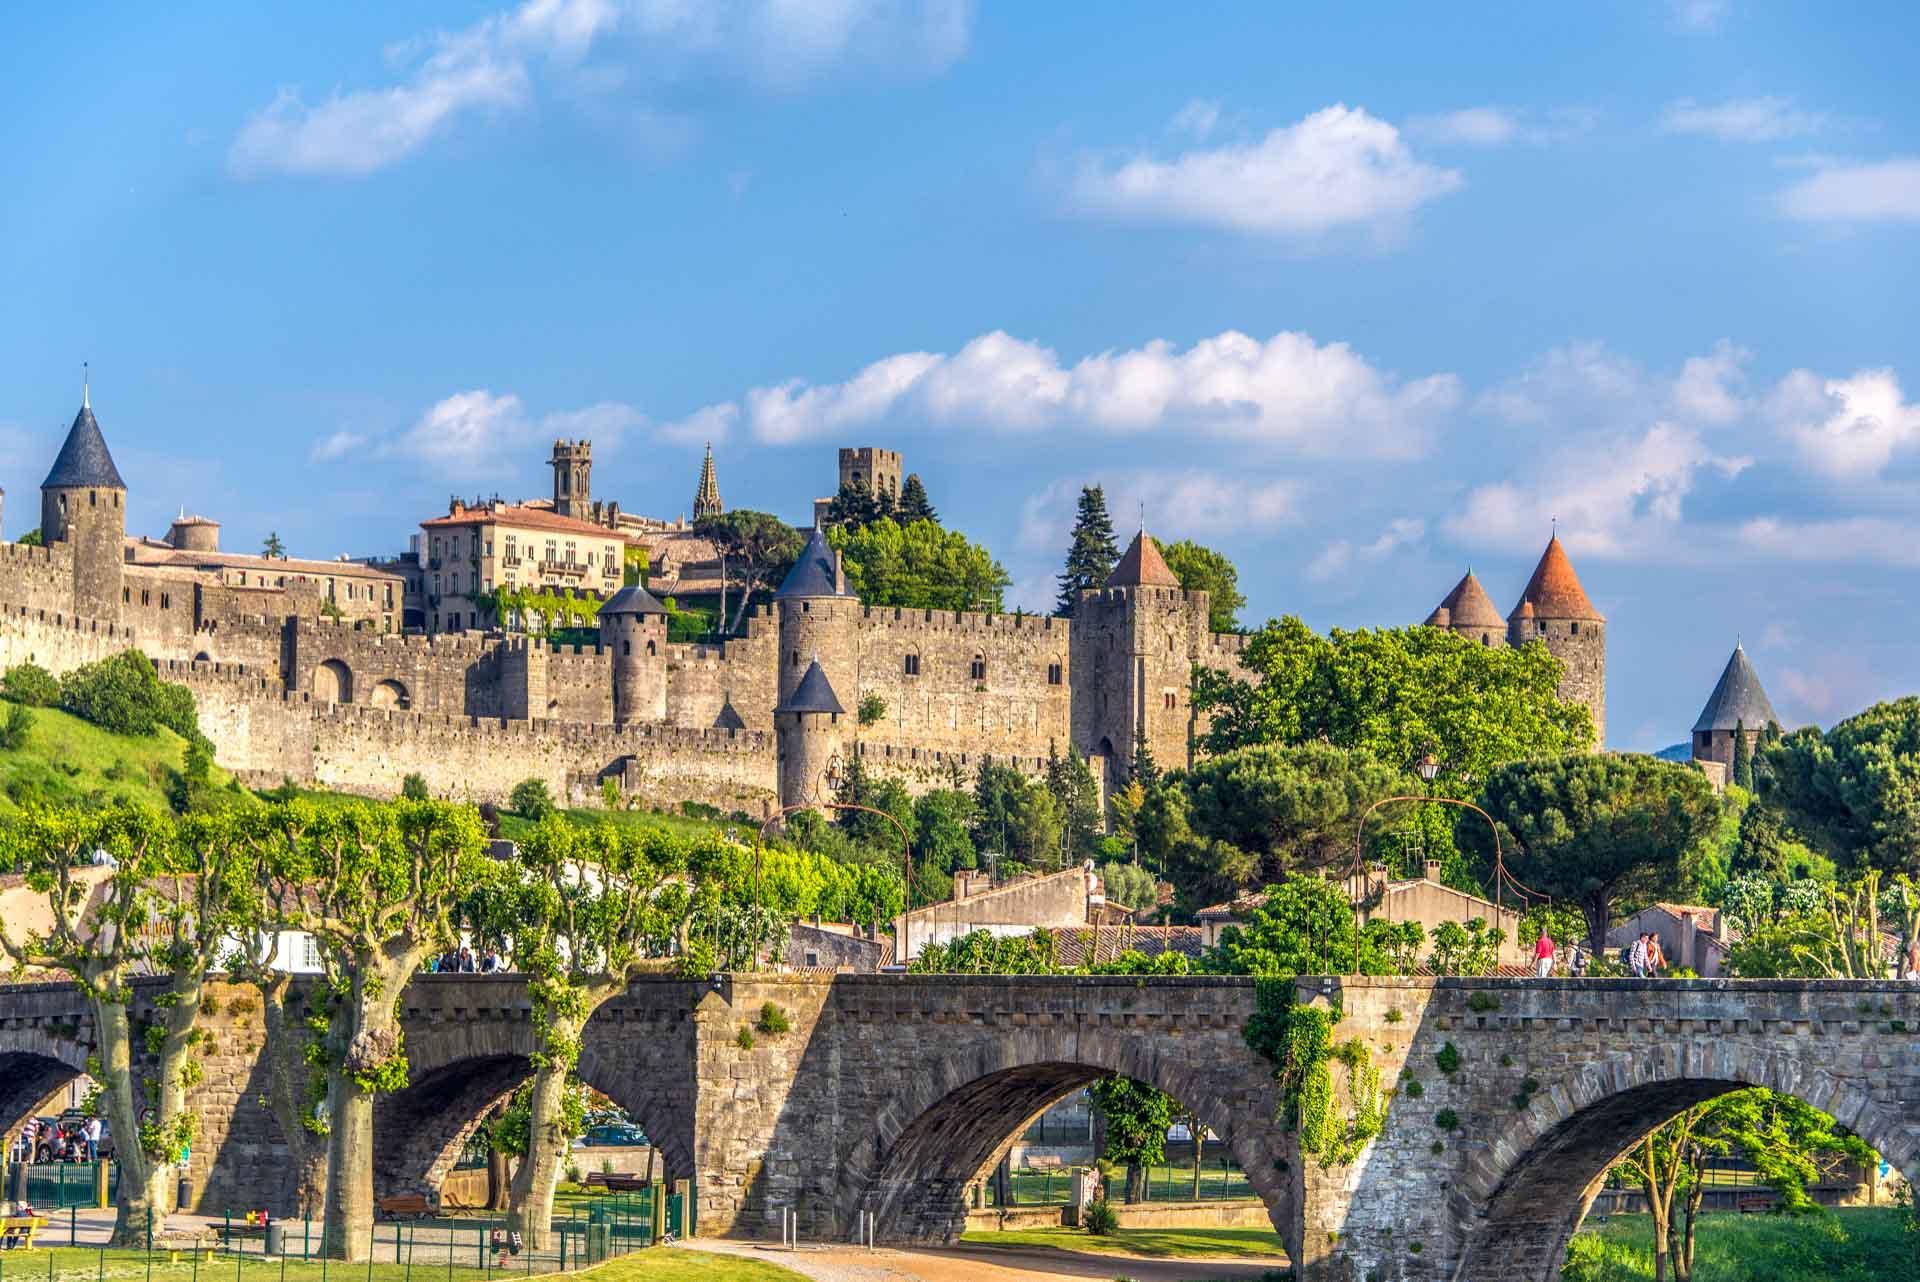 Les remparts de Carcassonne © Laurent Pictarena - AdobeStock